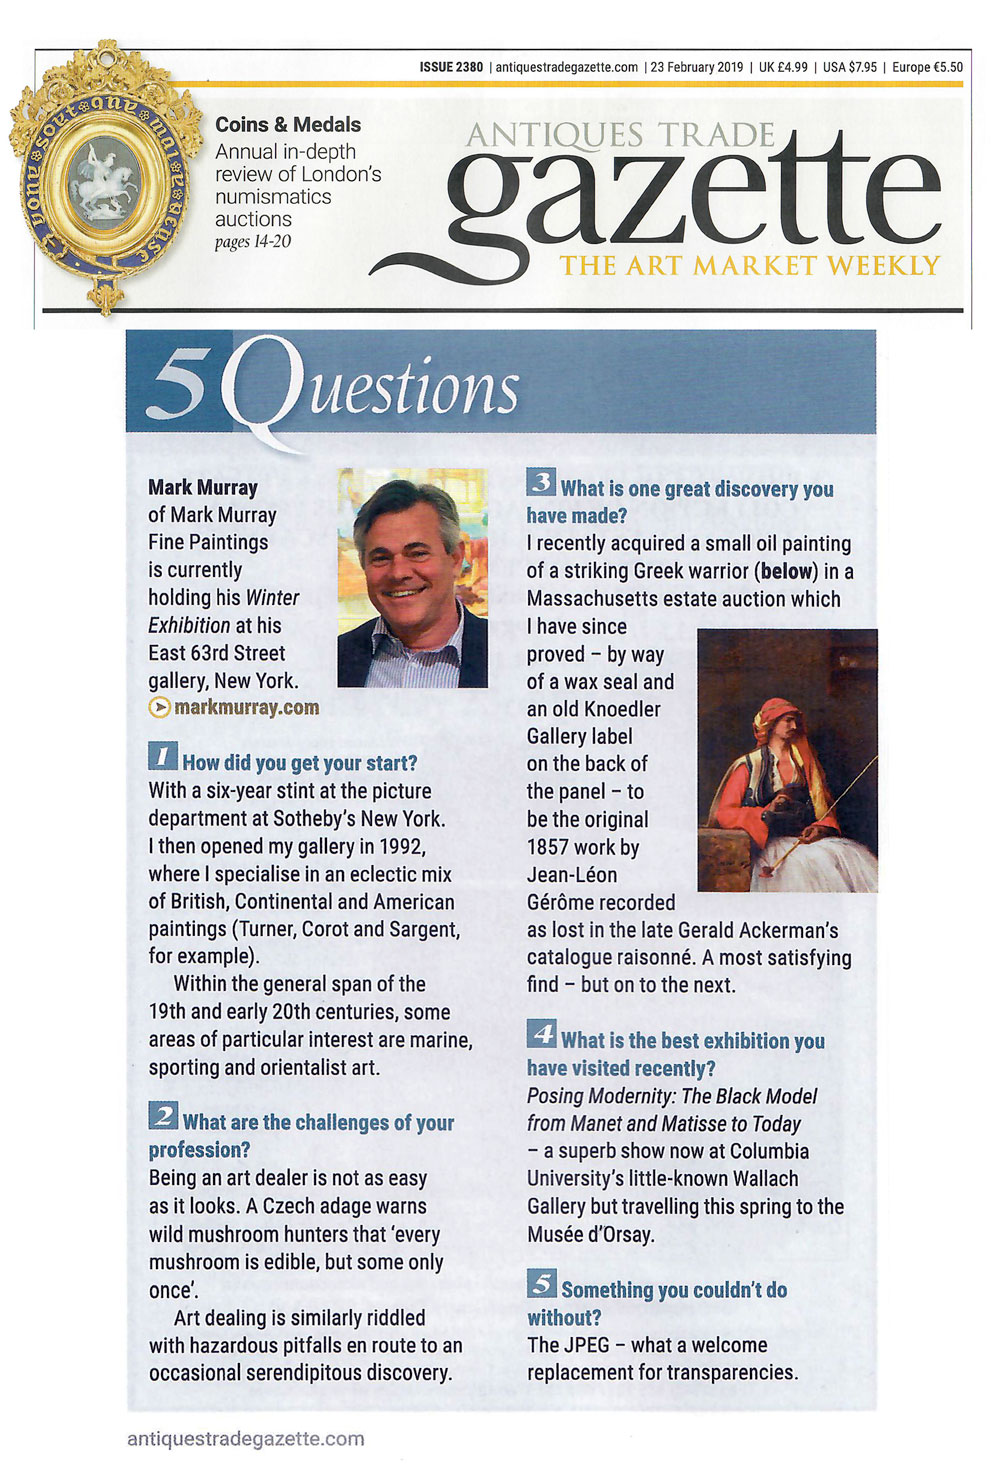 Antiques-Trade-Gazette-Mark-Murray-5-Questions-article.jpg